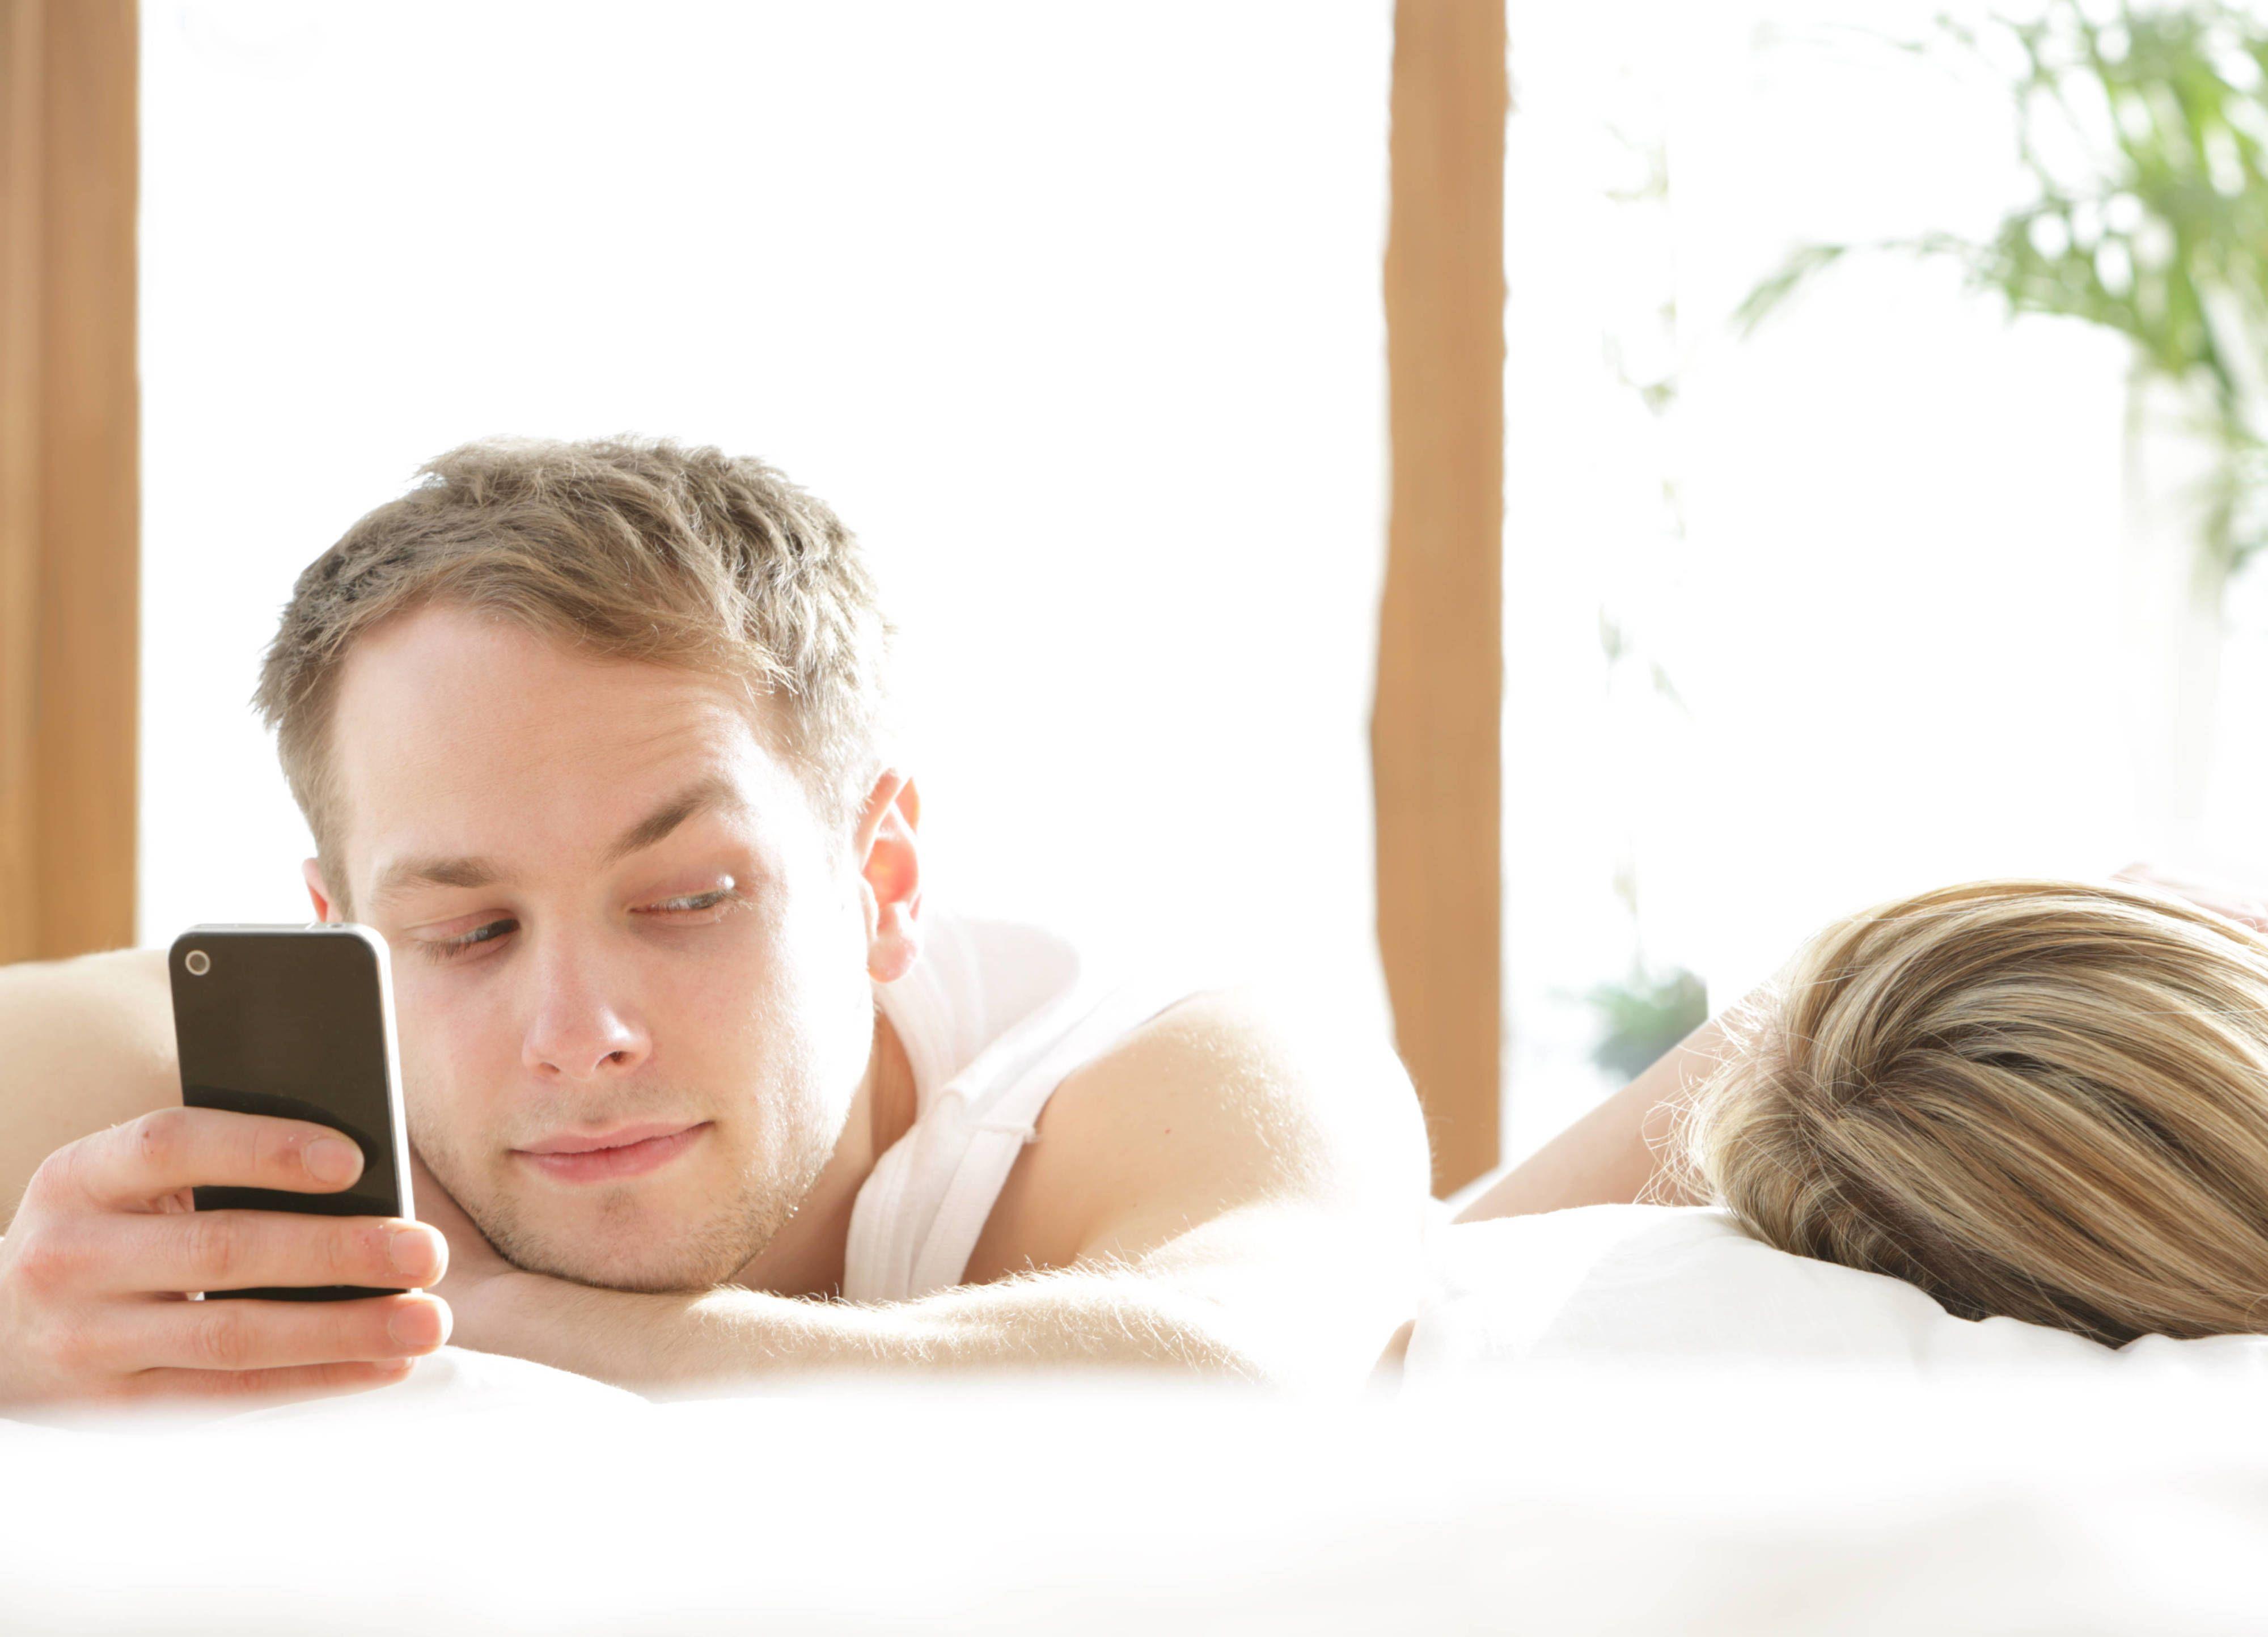 Betale via telefon online dating